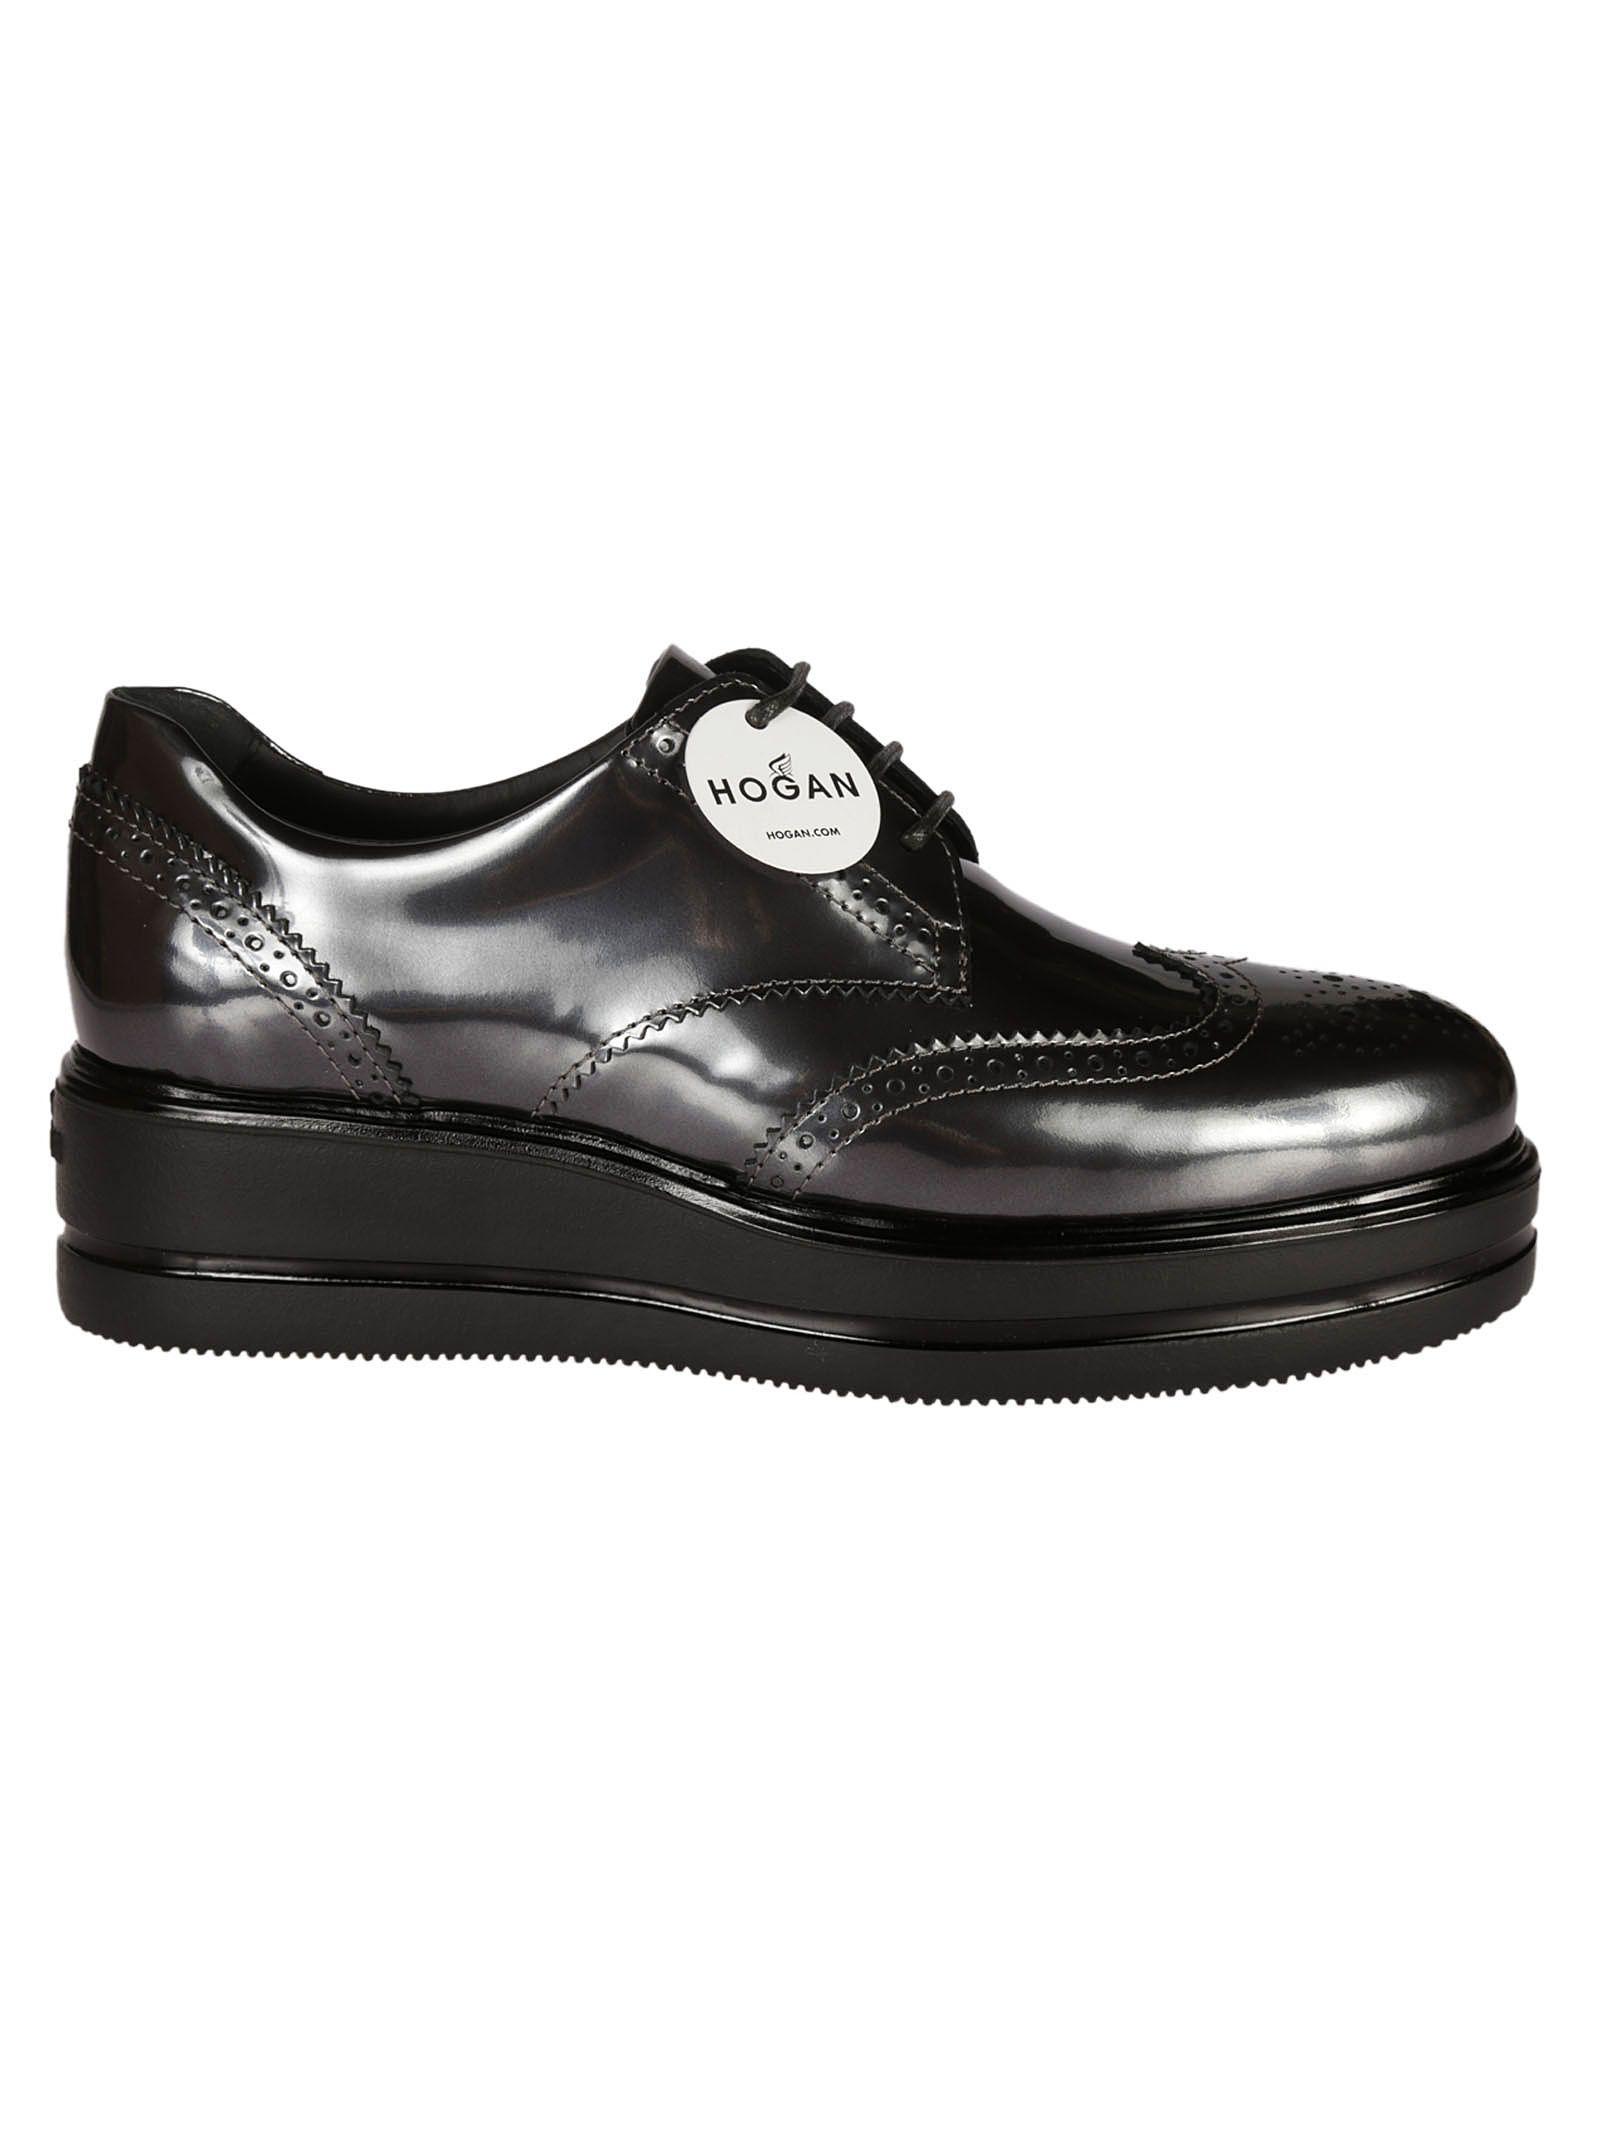 Hogan Francesina H323 Derby Shoes In Black   ModeSens